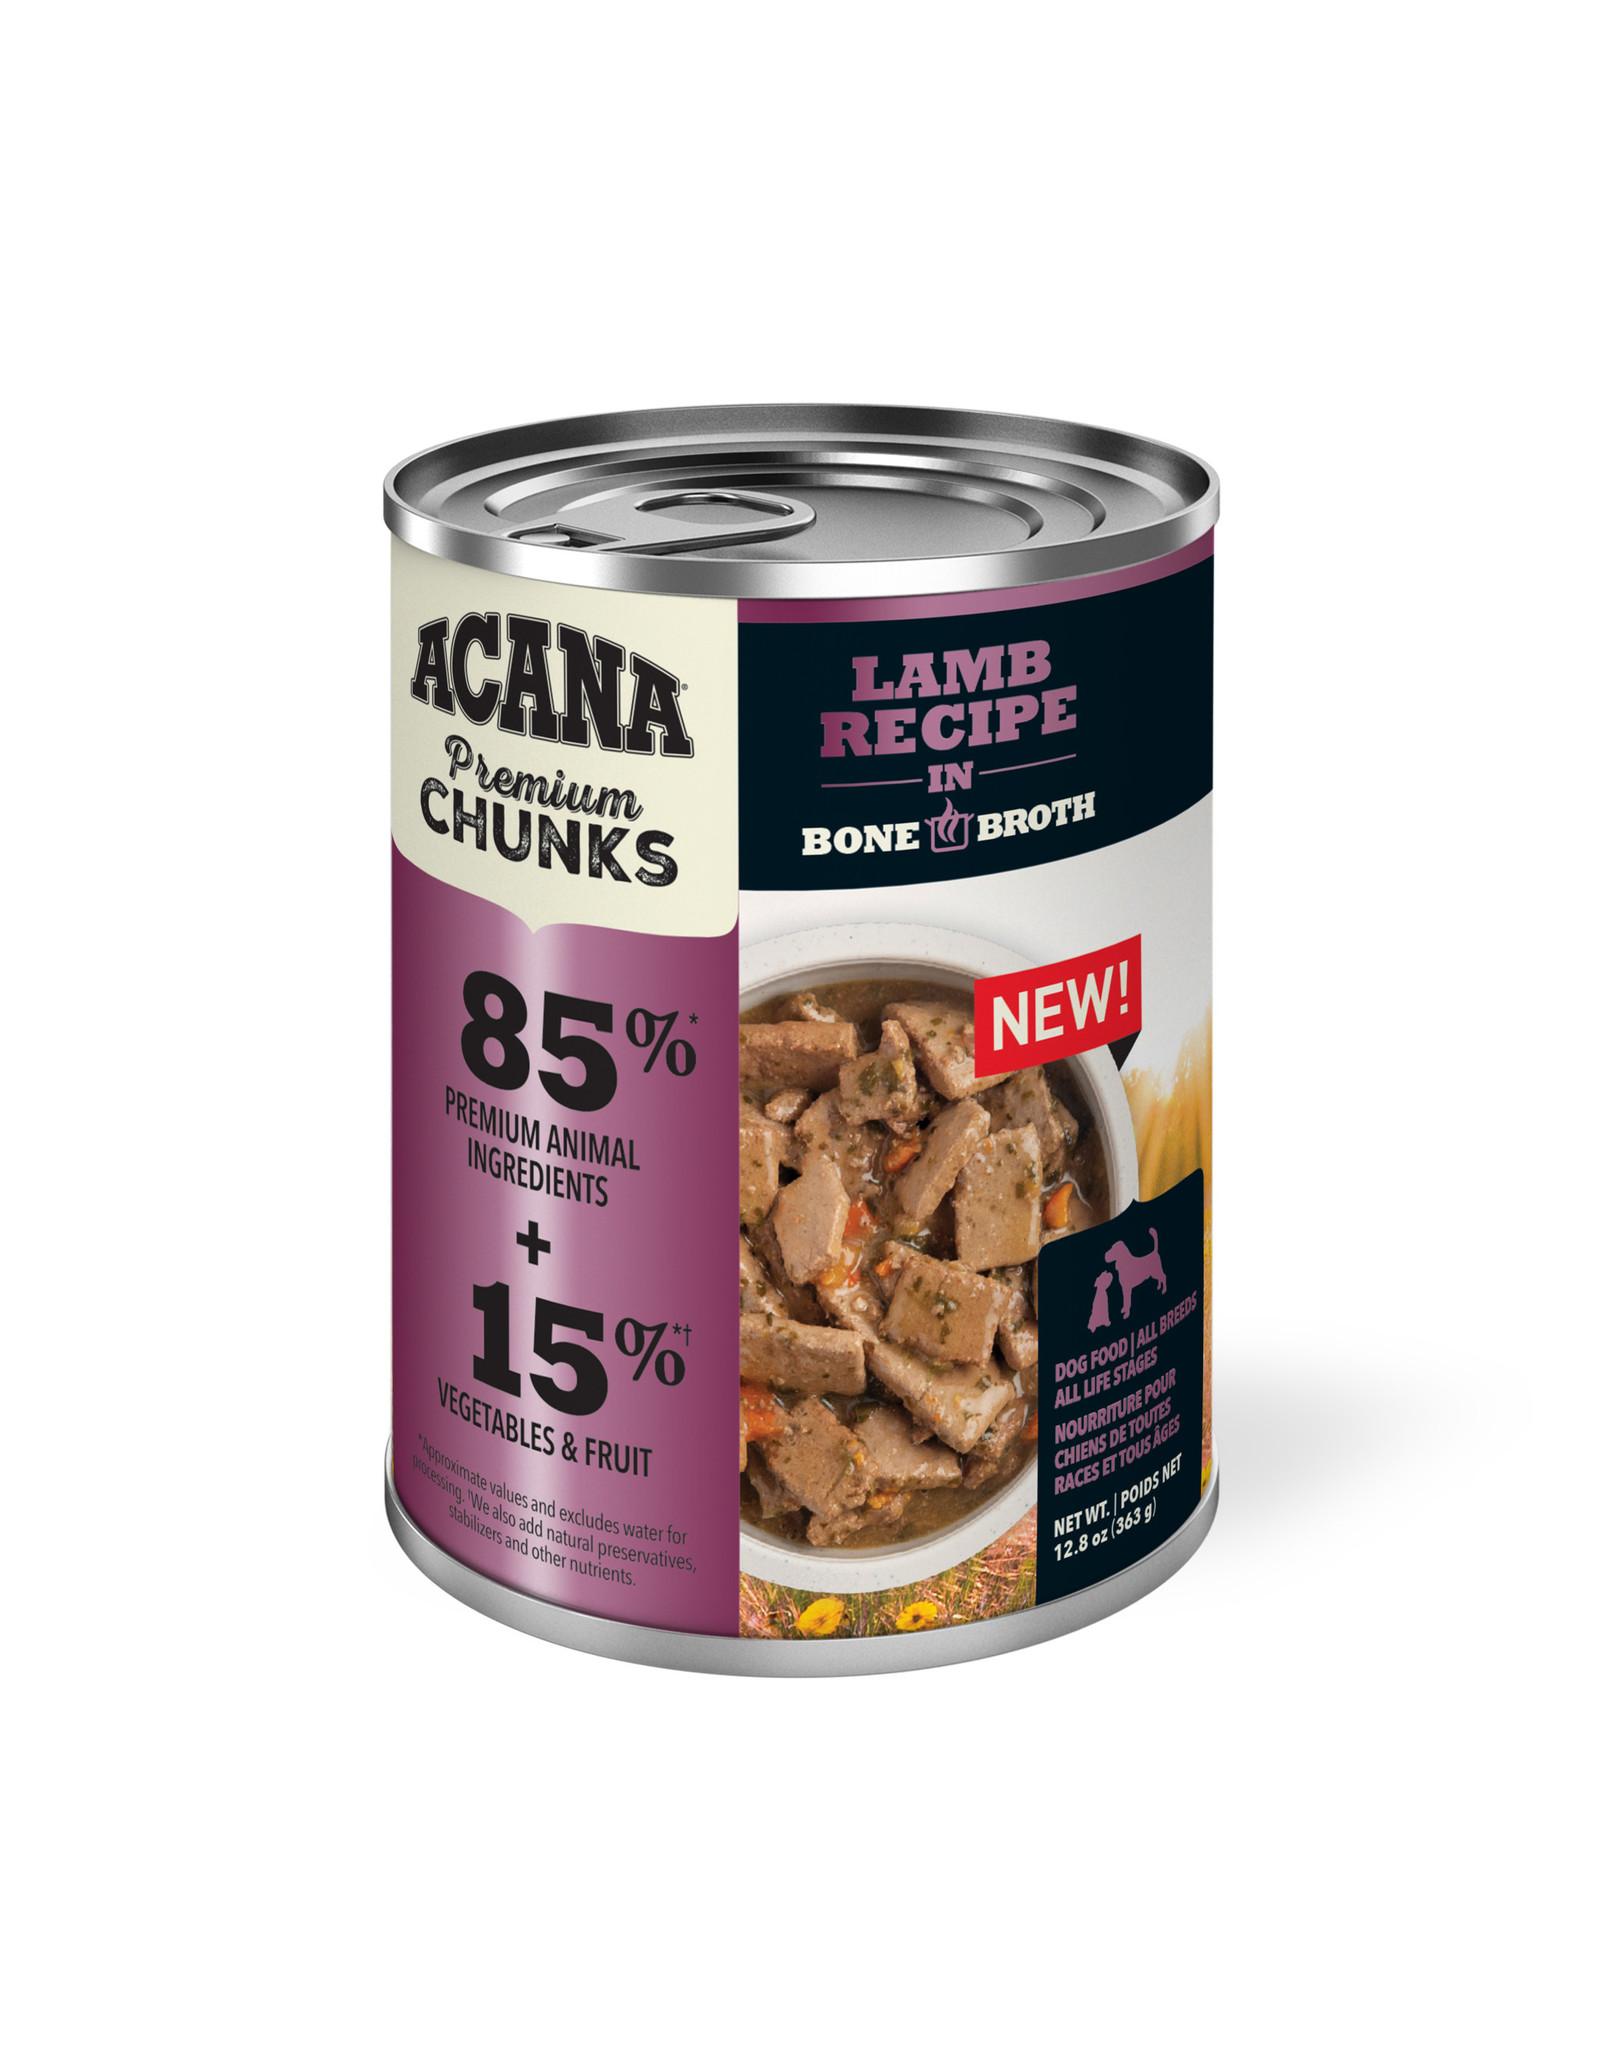 Acana Acana Premium Chunks - Lamb Recipe [DOG] 363G